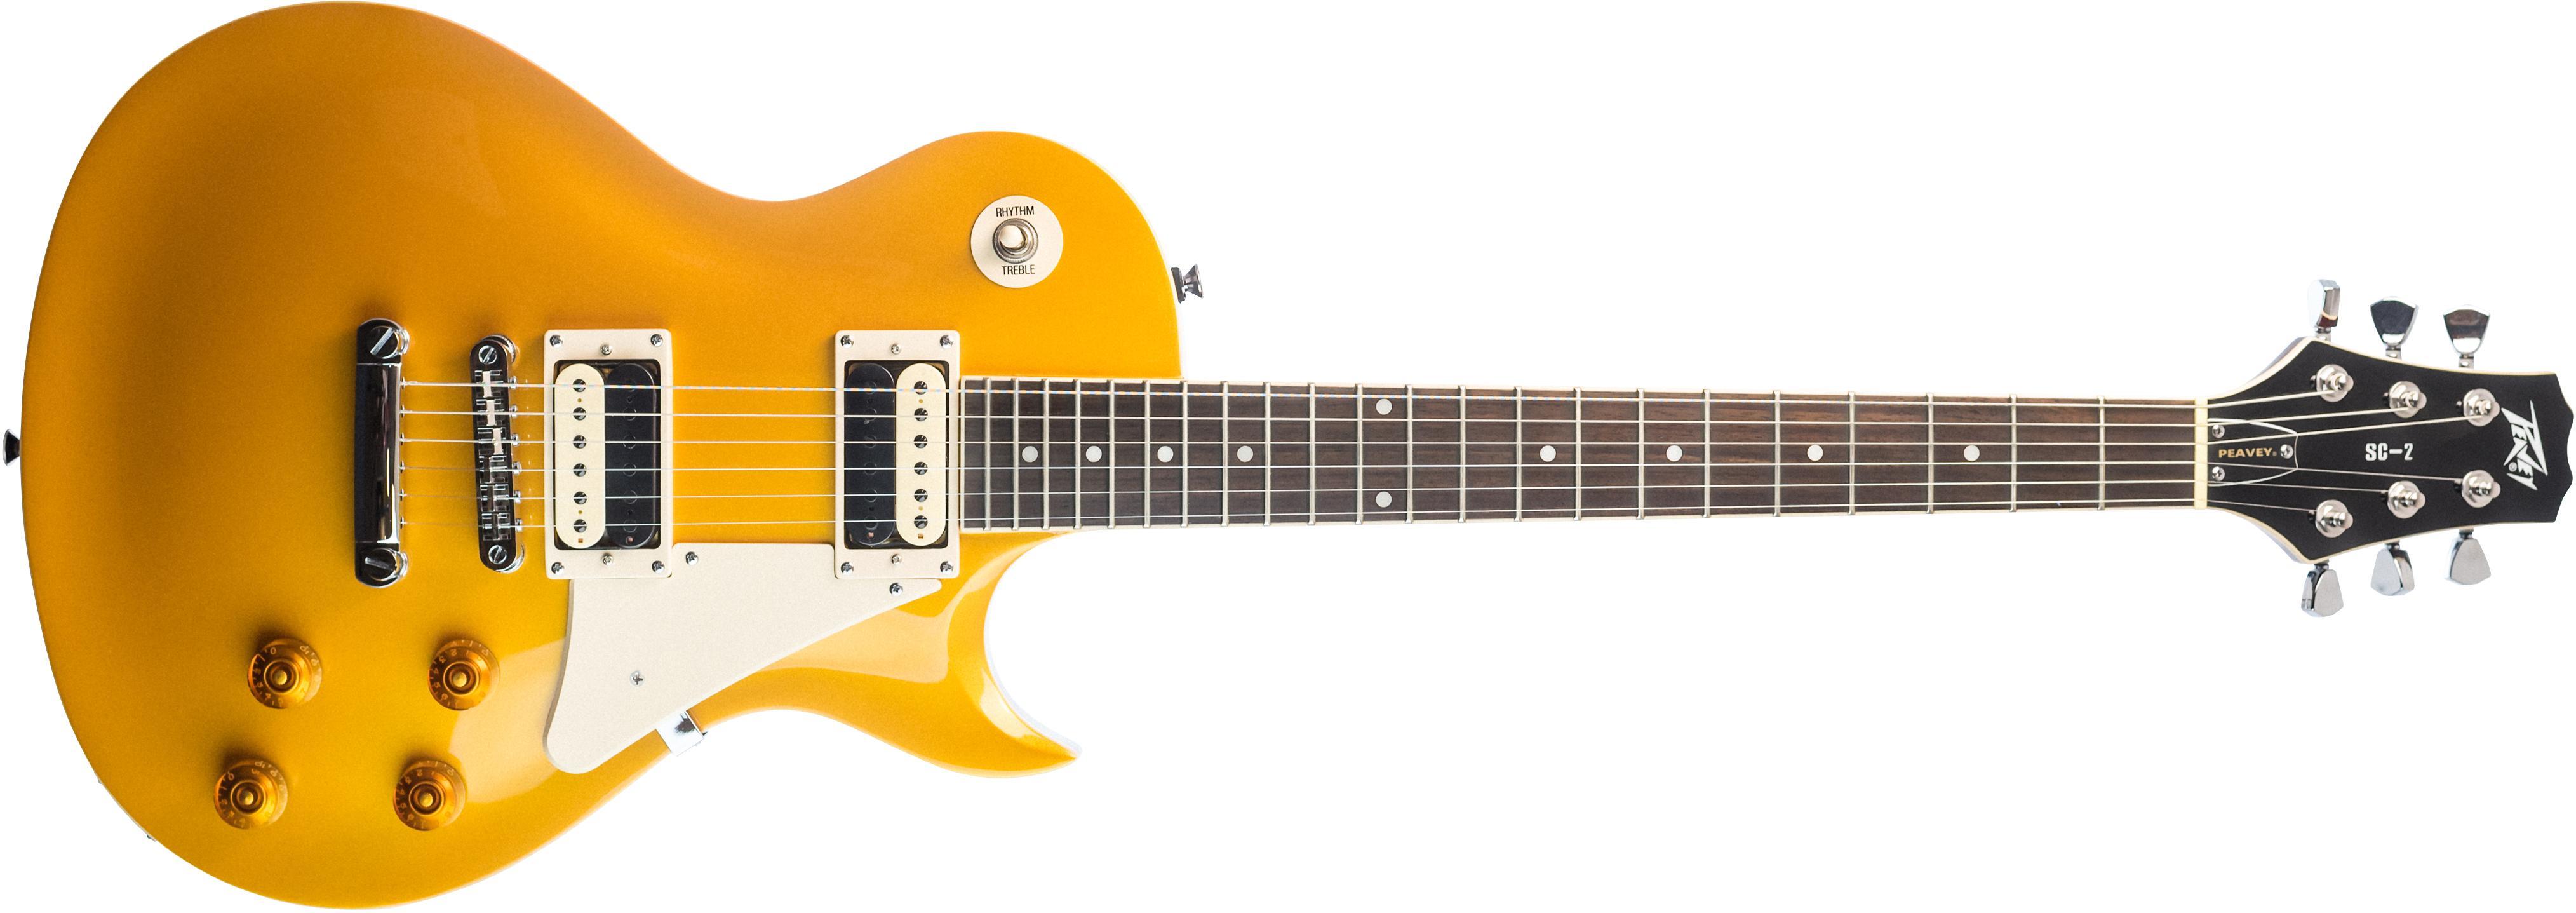 Peavey Nitro Wiring Diagrams Schematic Diagram Paul Reed Smith 5150 Guitar Schematics Horizon Ii Diy